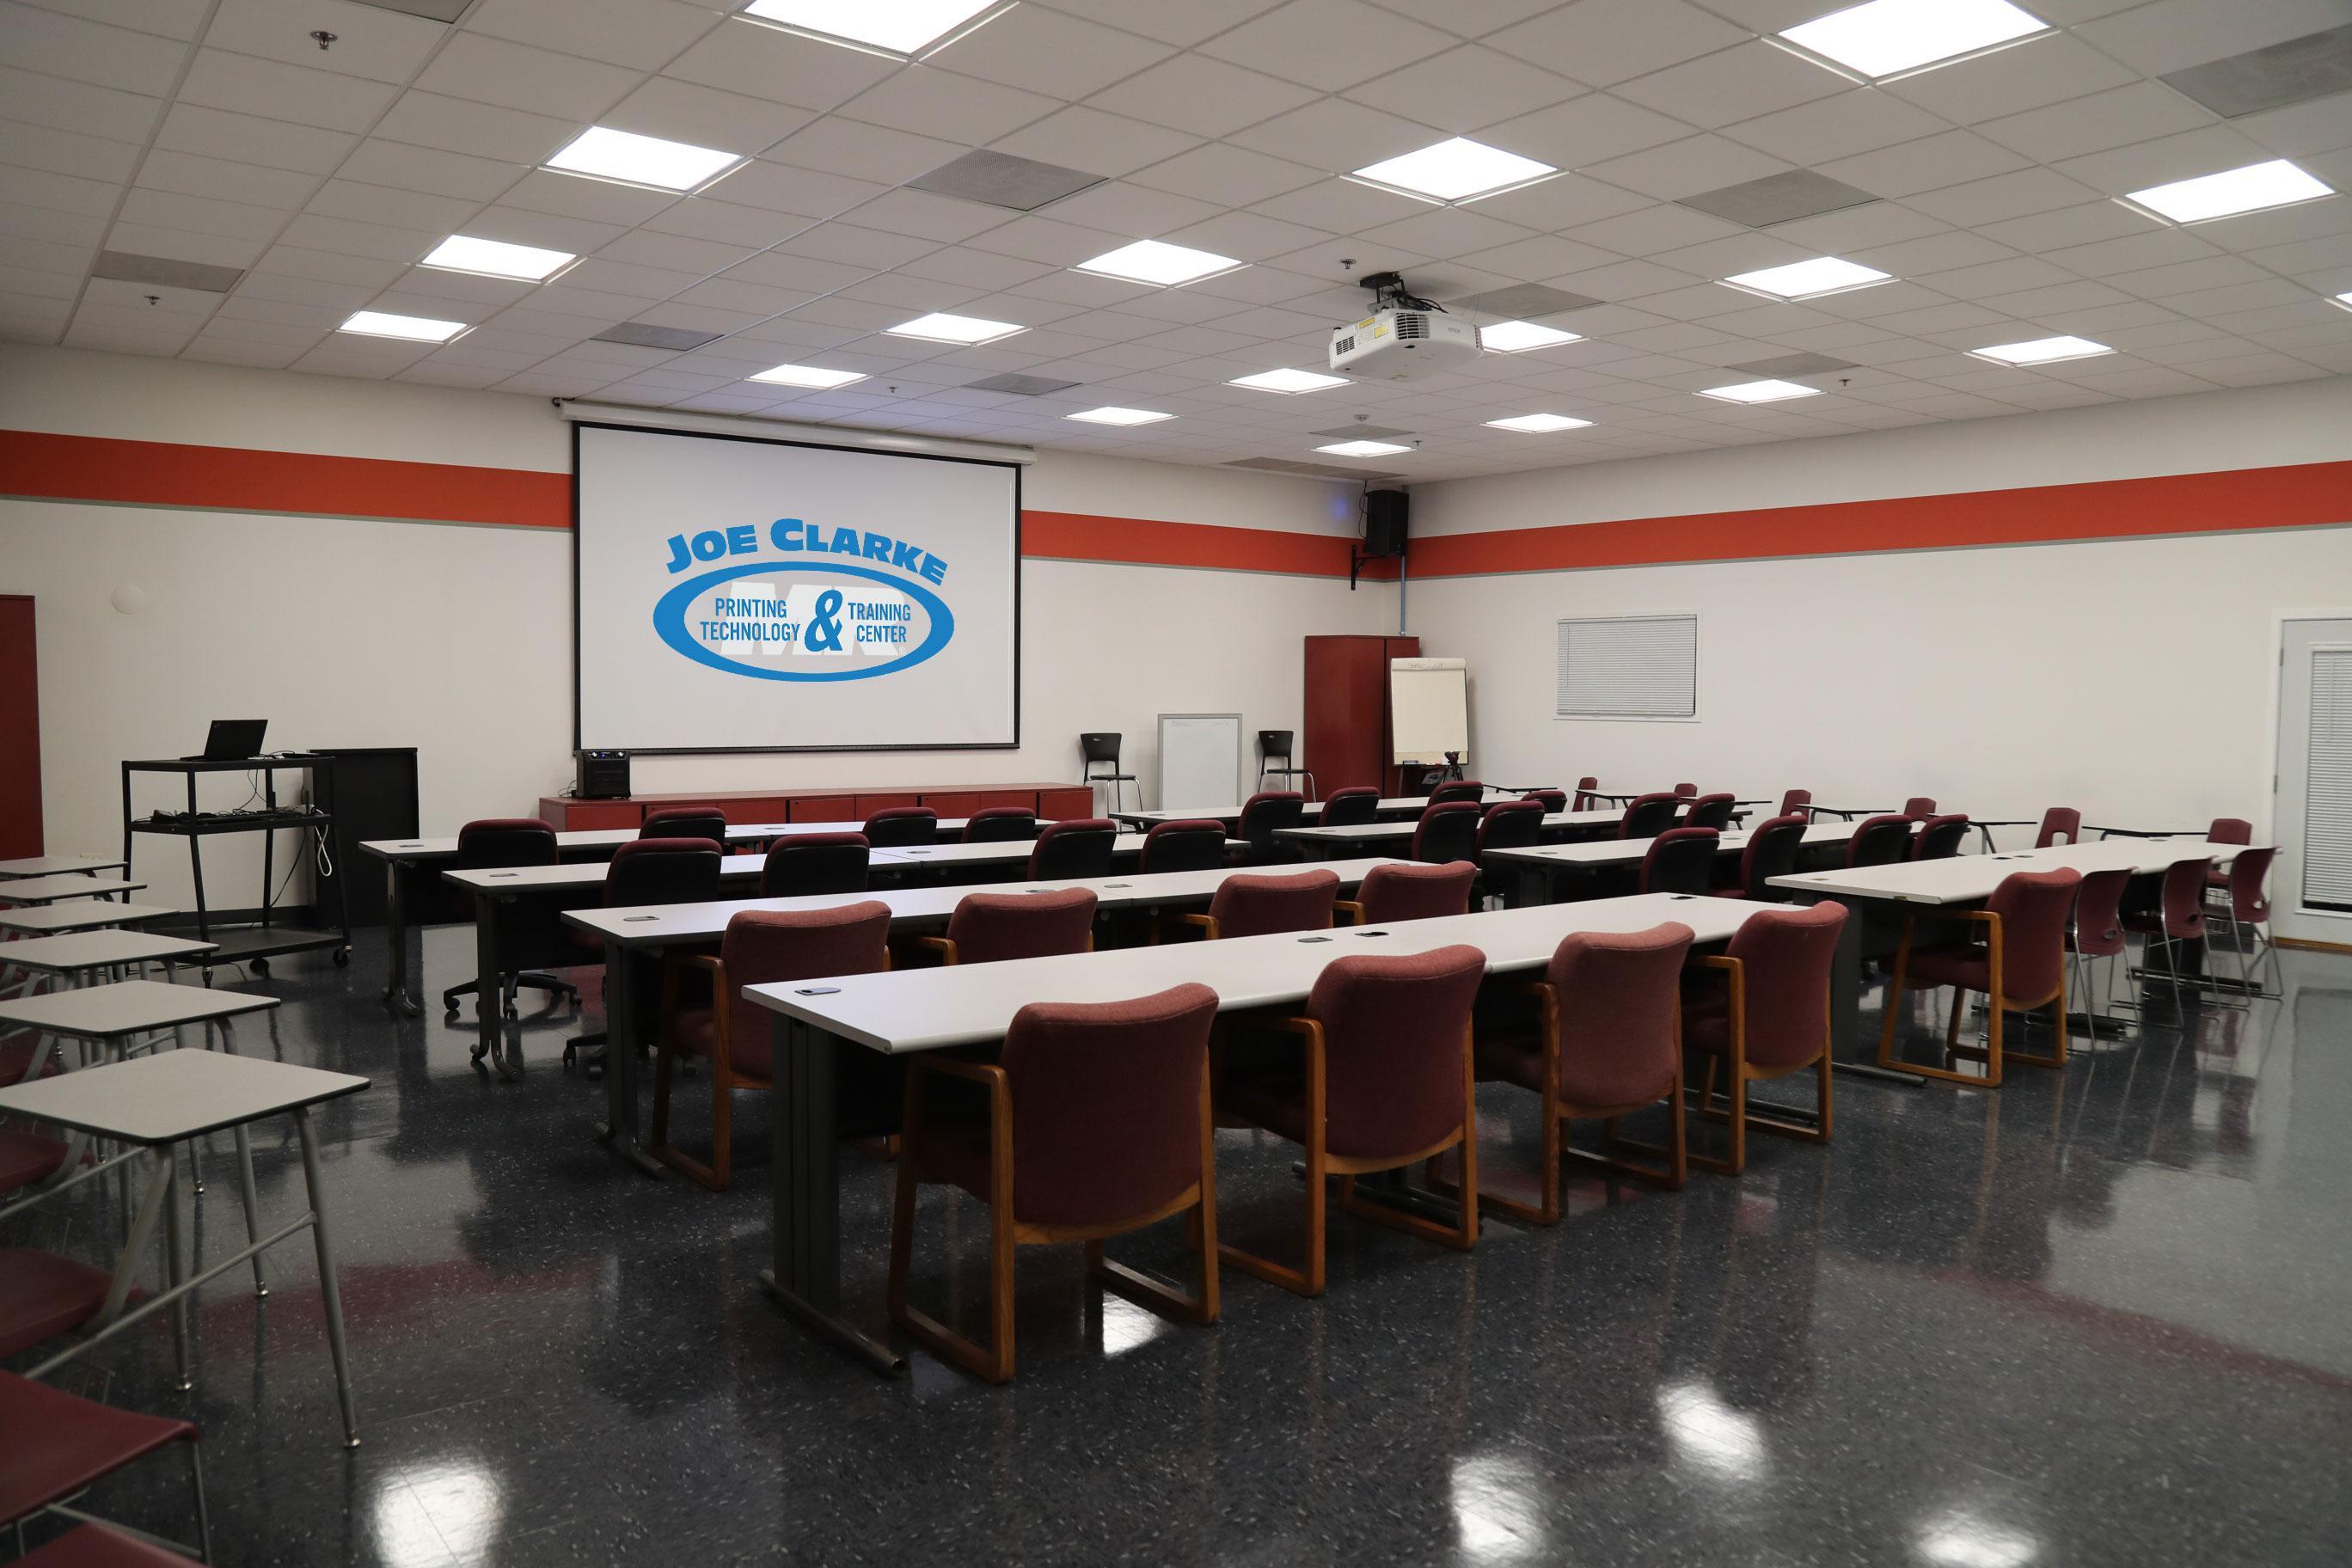 Joe Clarke classroom